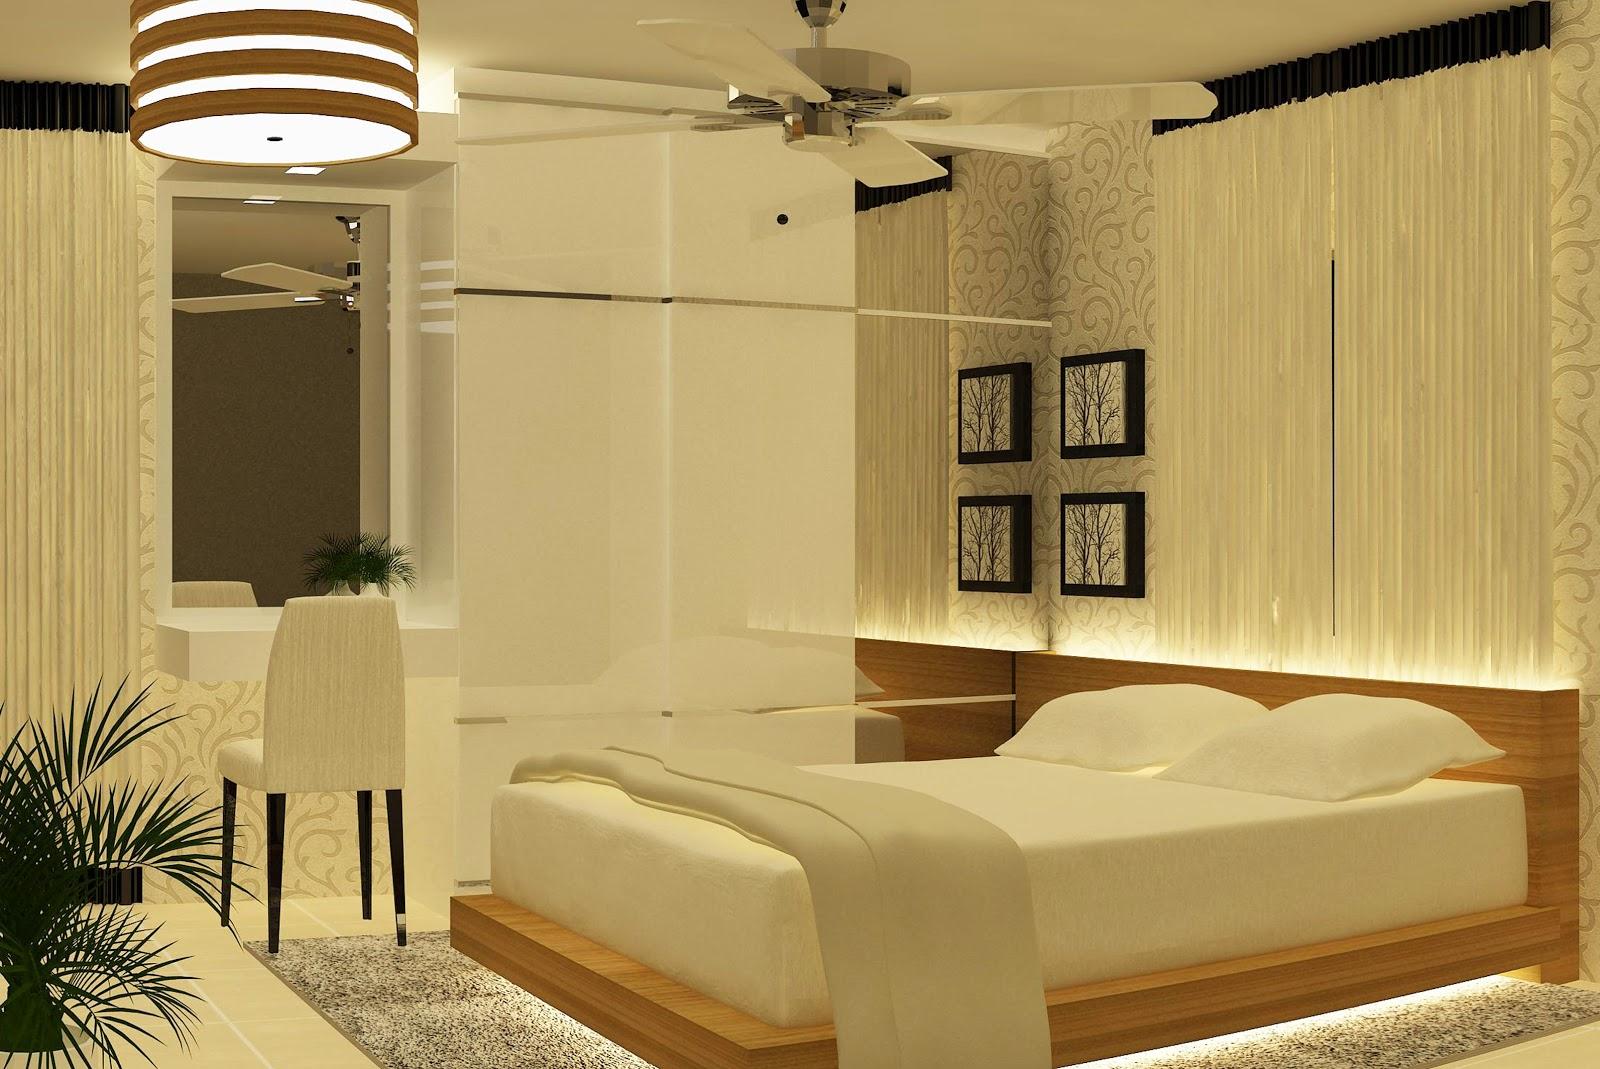 Studio Condo Designs Joy Studio Design Gallery Best Design